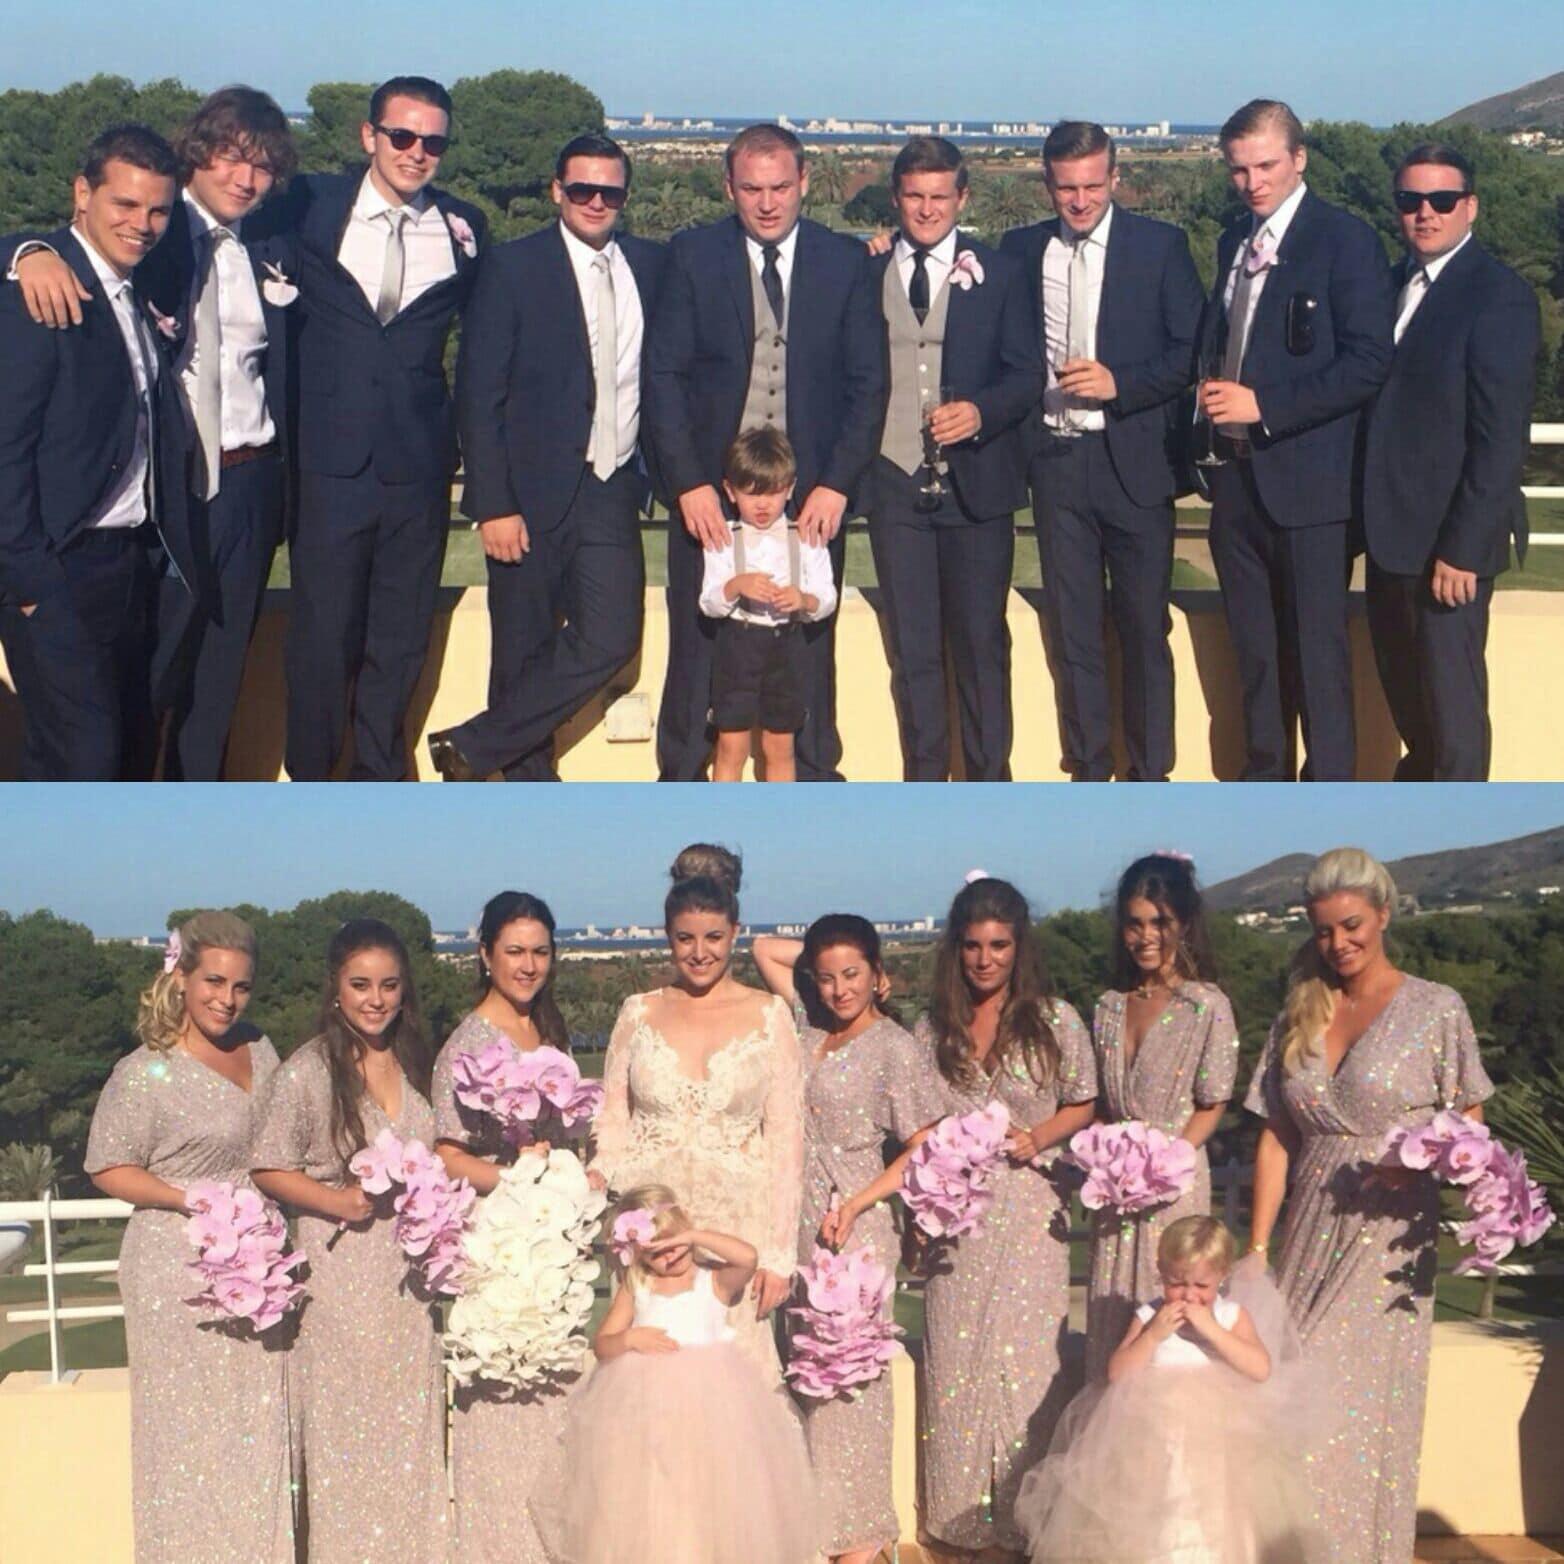 McMahon Wedding Group